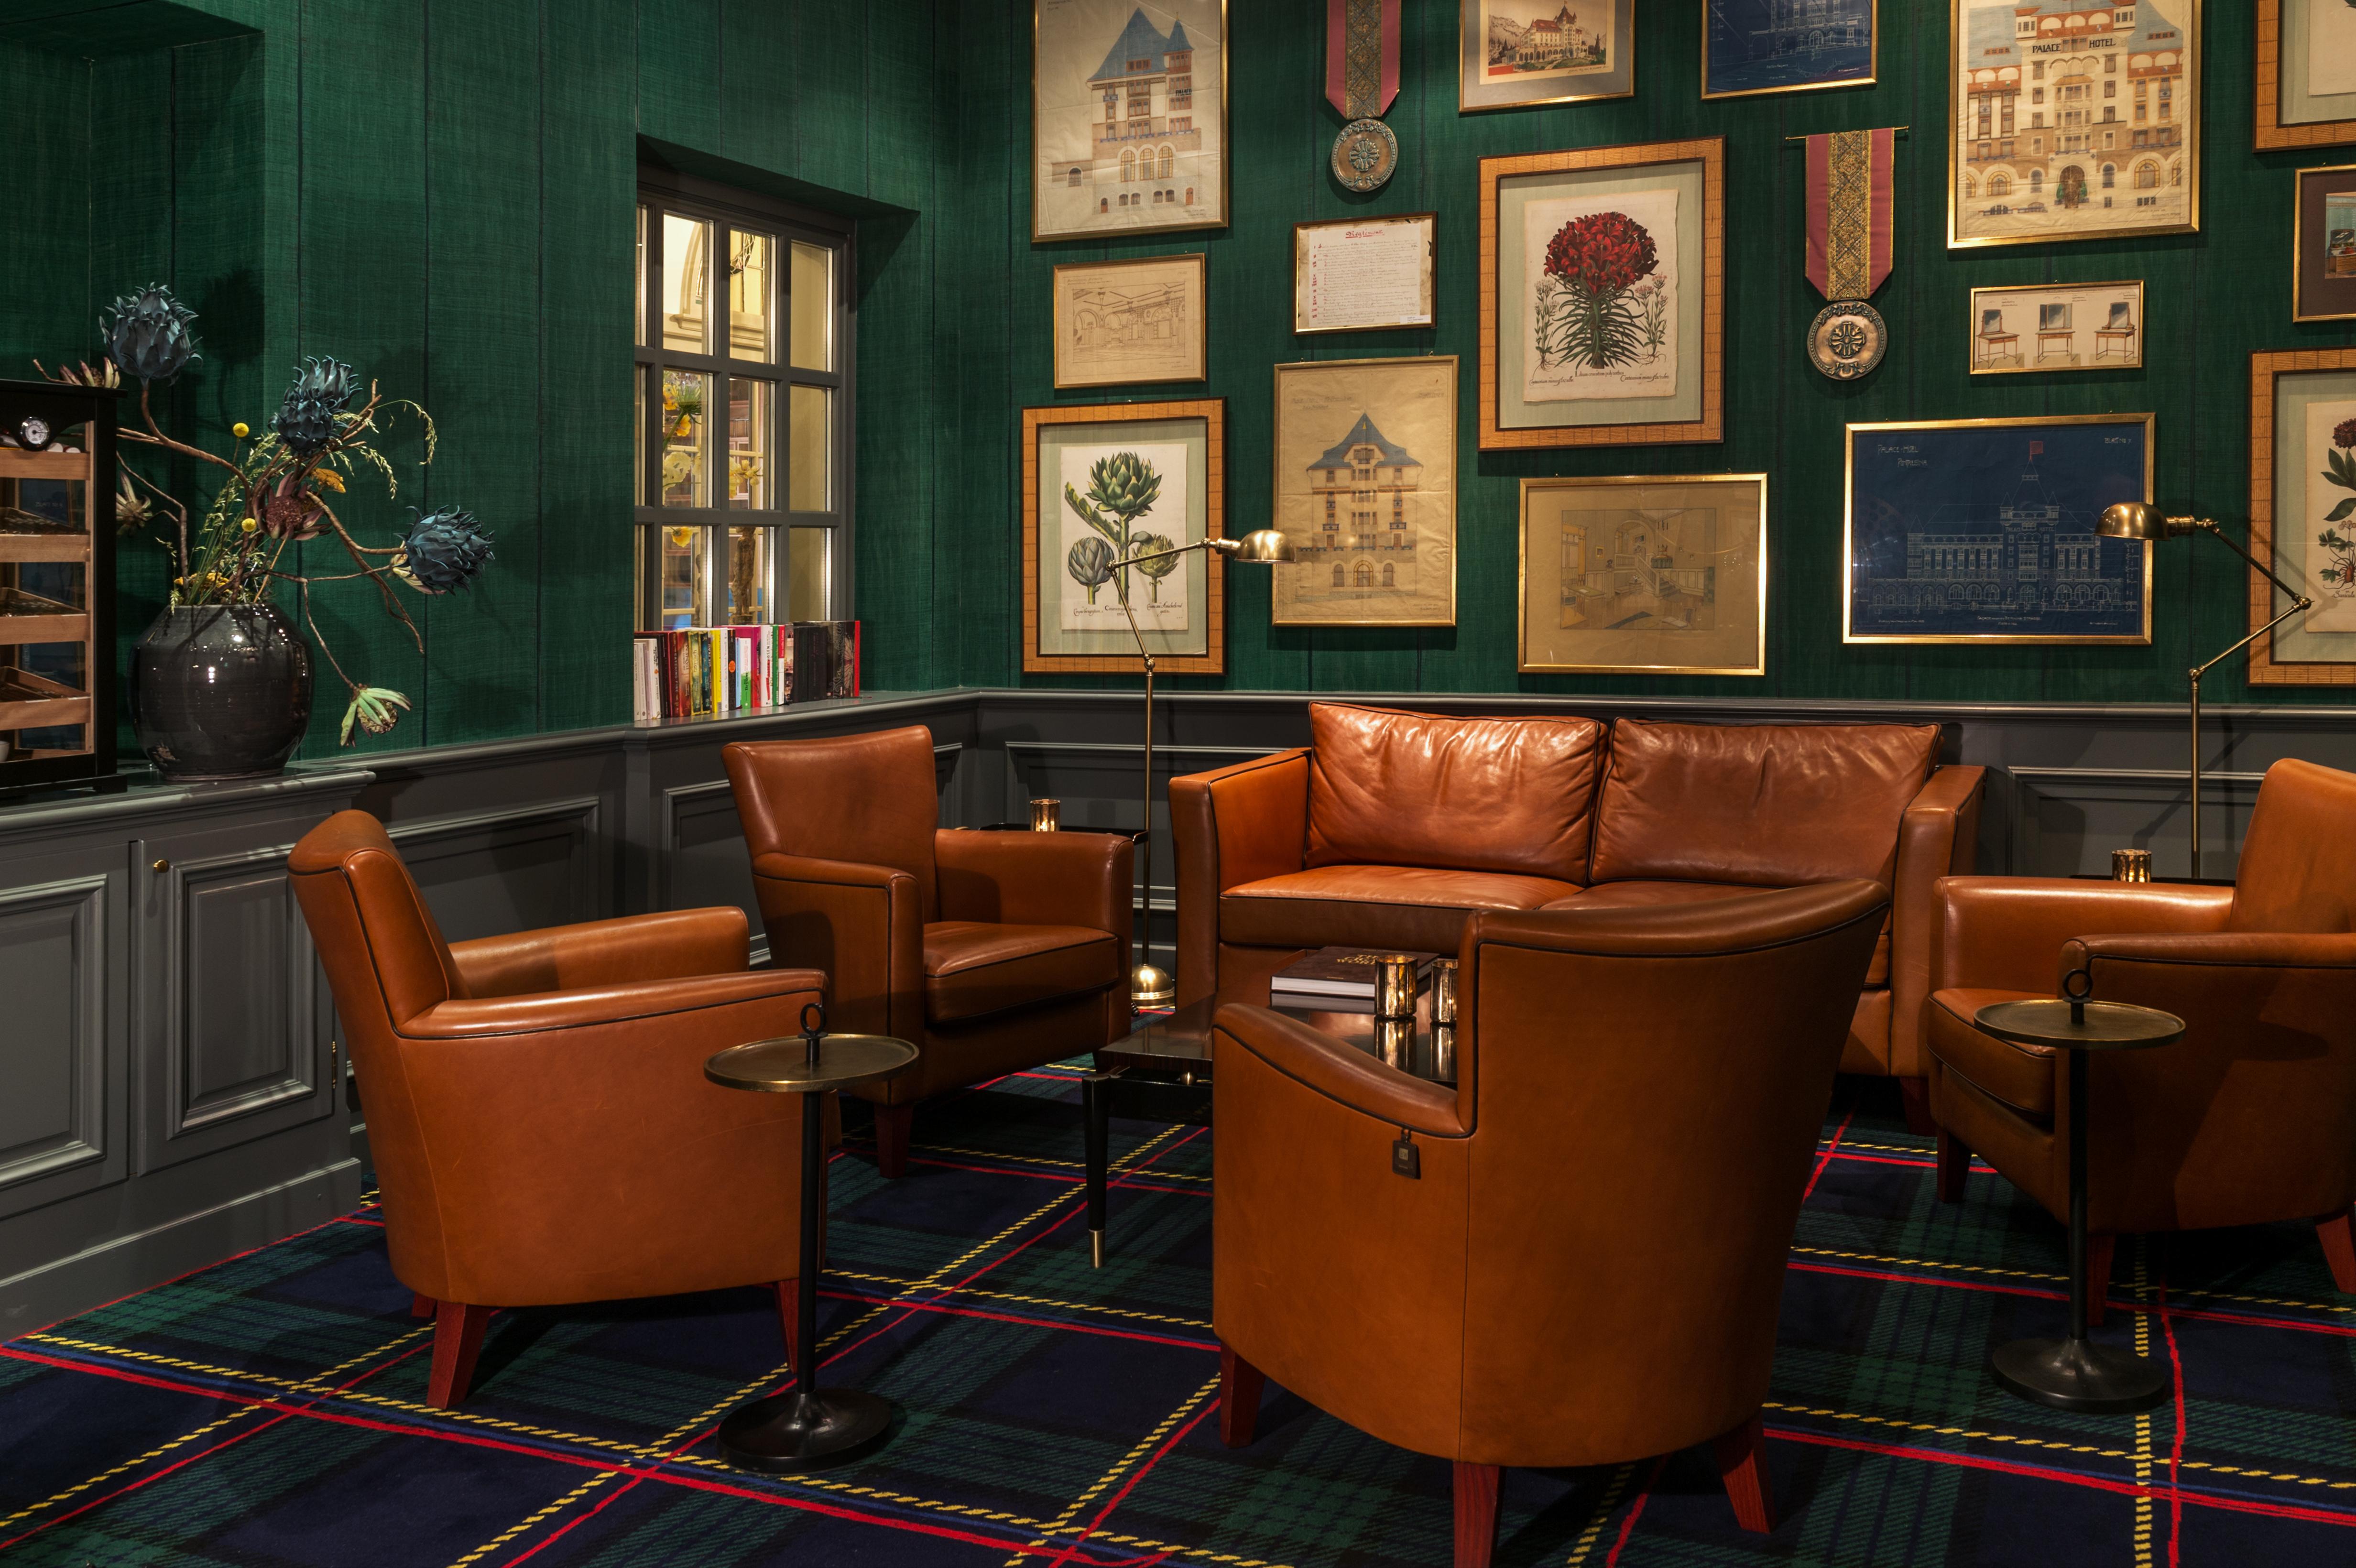 Smoker's Lounge Hotel Walther Slide 1